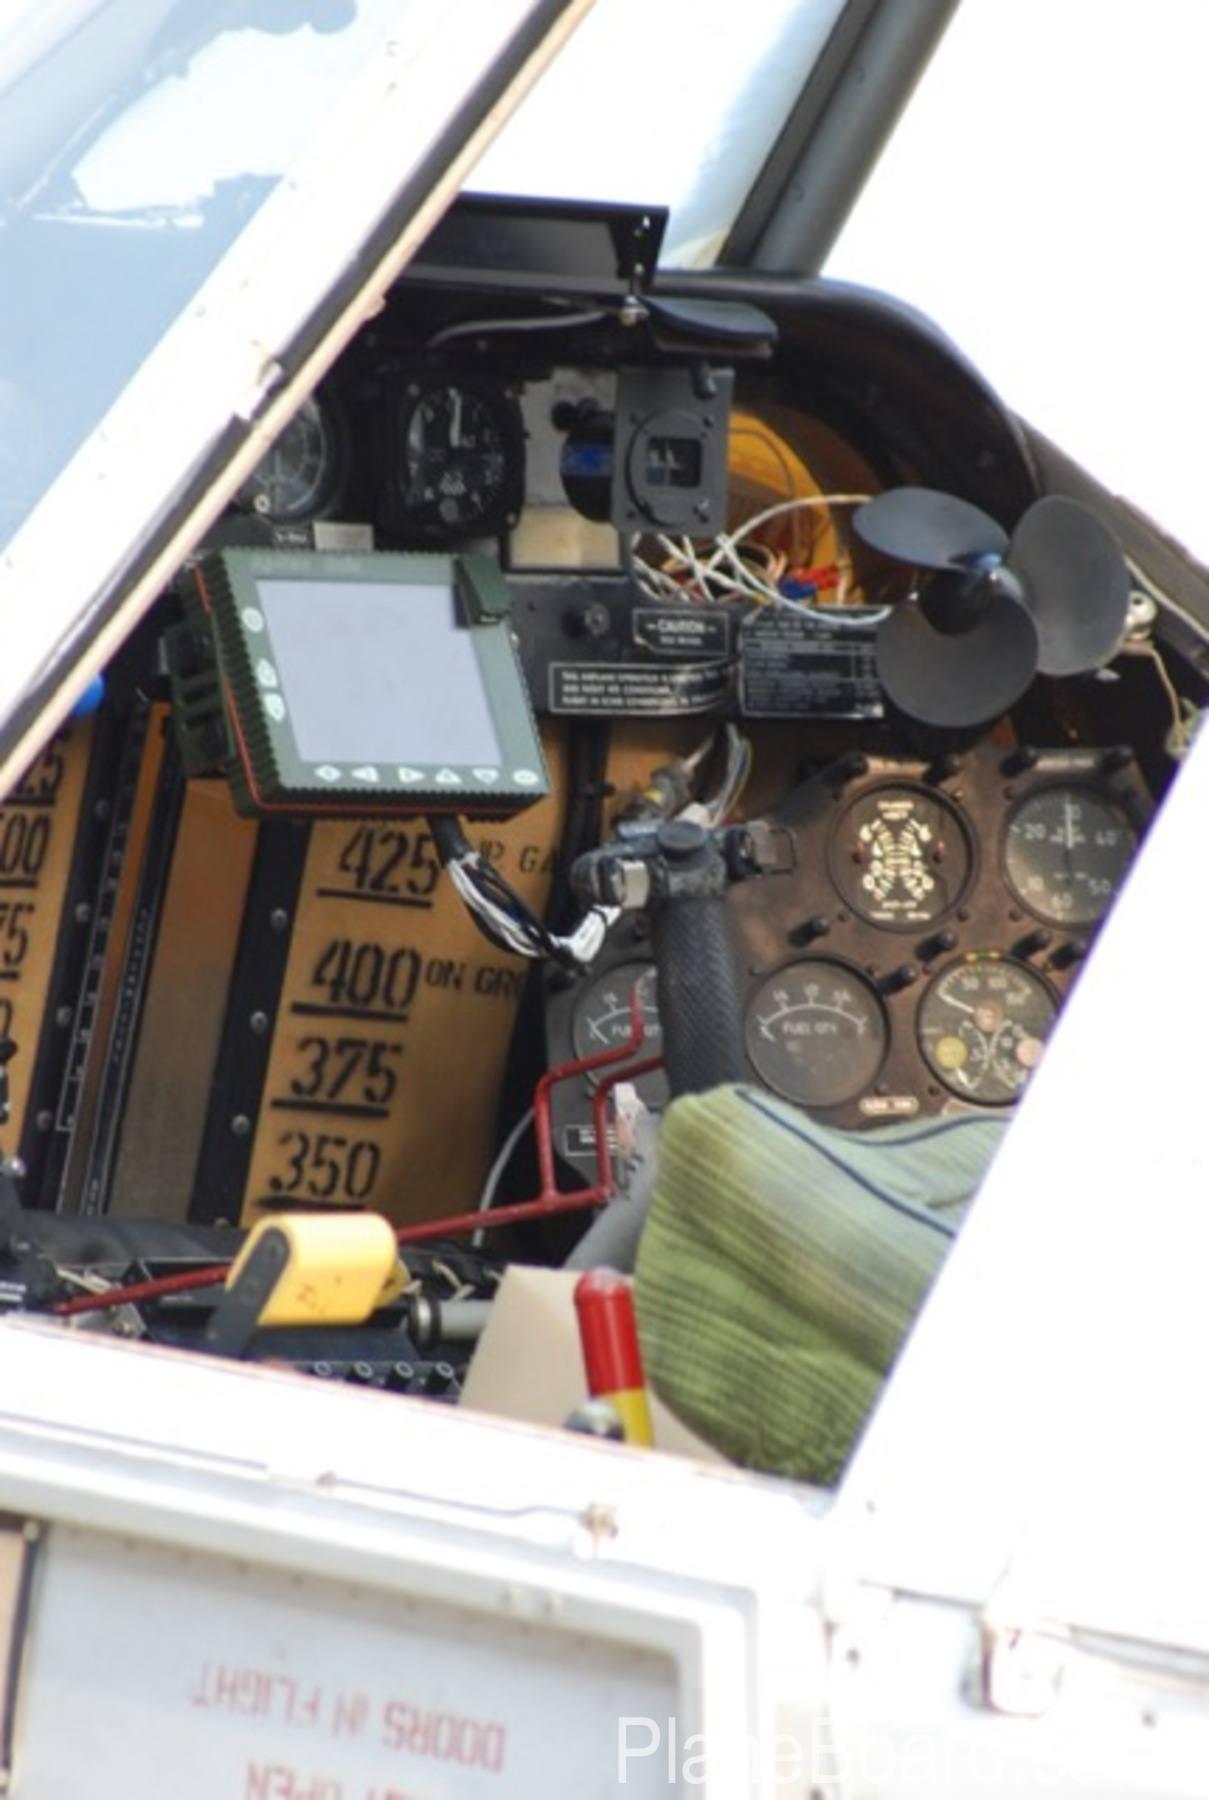 1994 PZL M18 Dromader interior 3